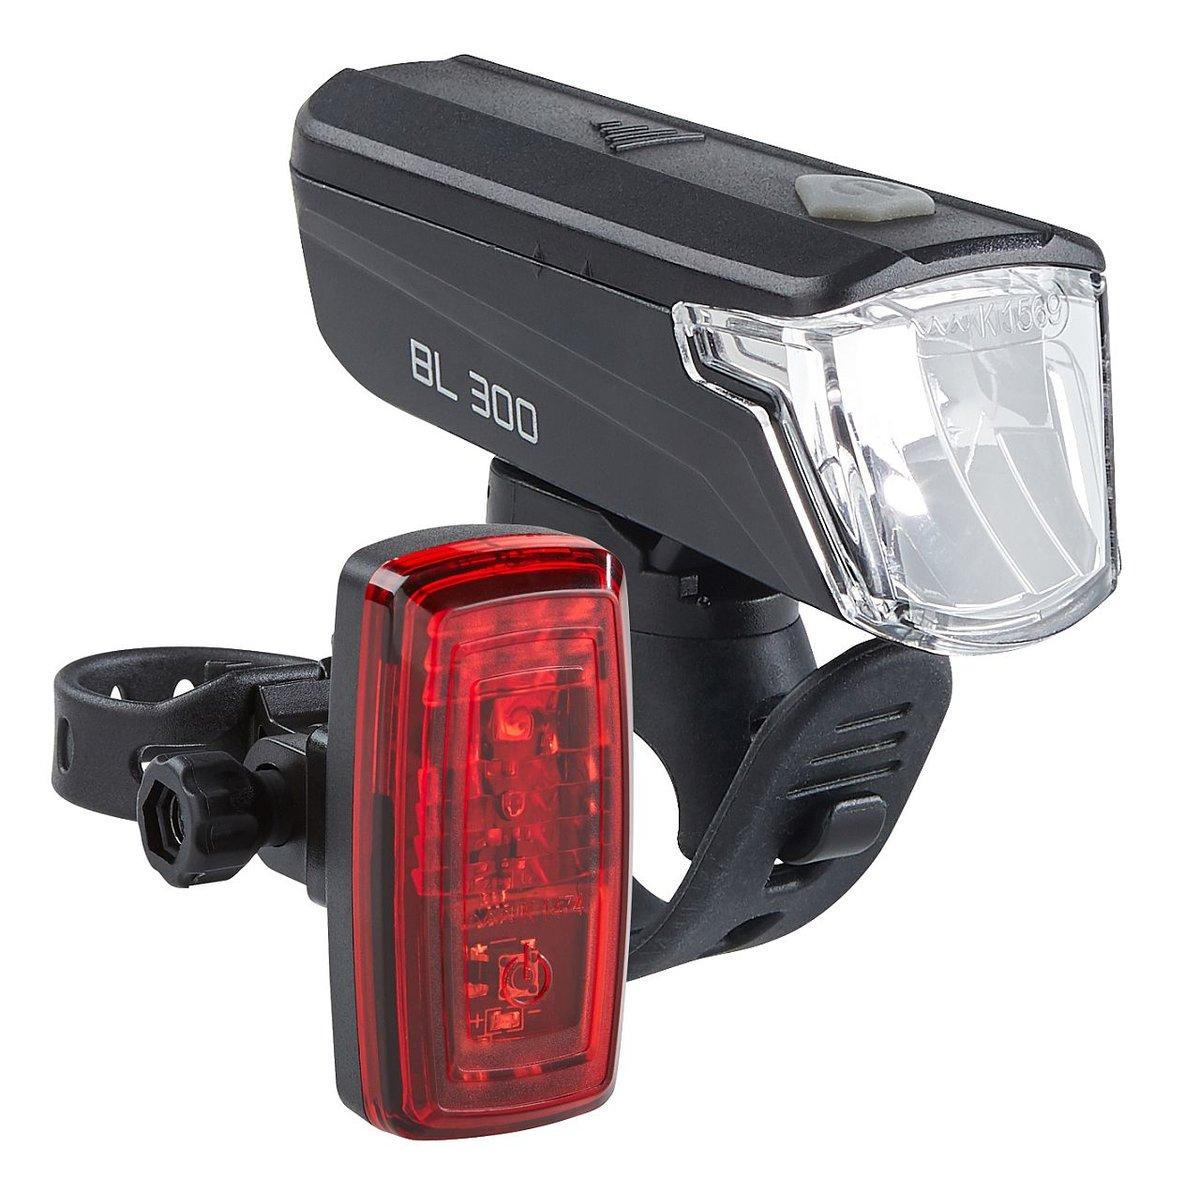 LED Fahrrad-Batterieleuchtenset StVZO Schwarz Batterie-Lampen-Set LED-Rücklicht